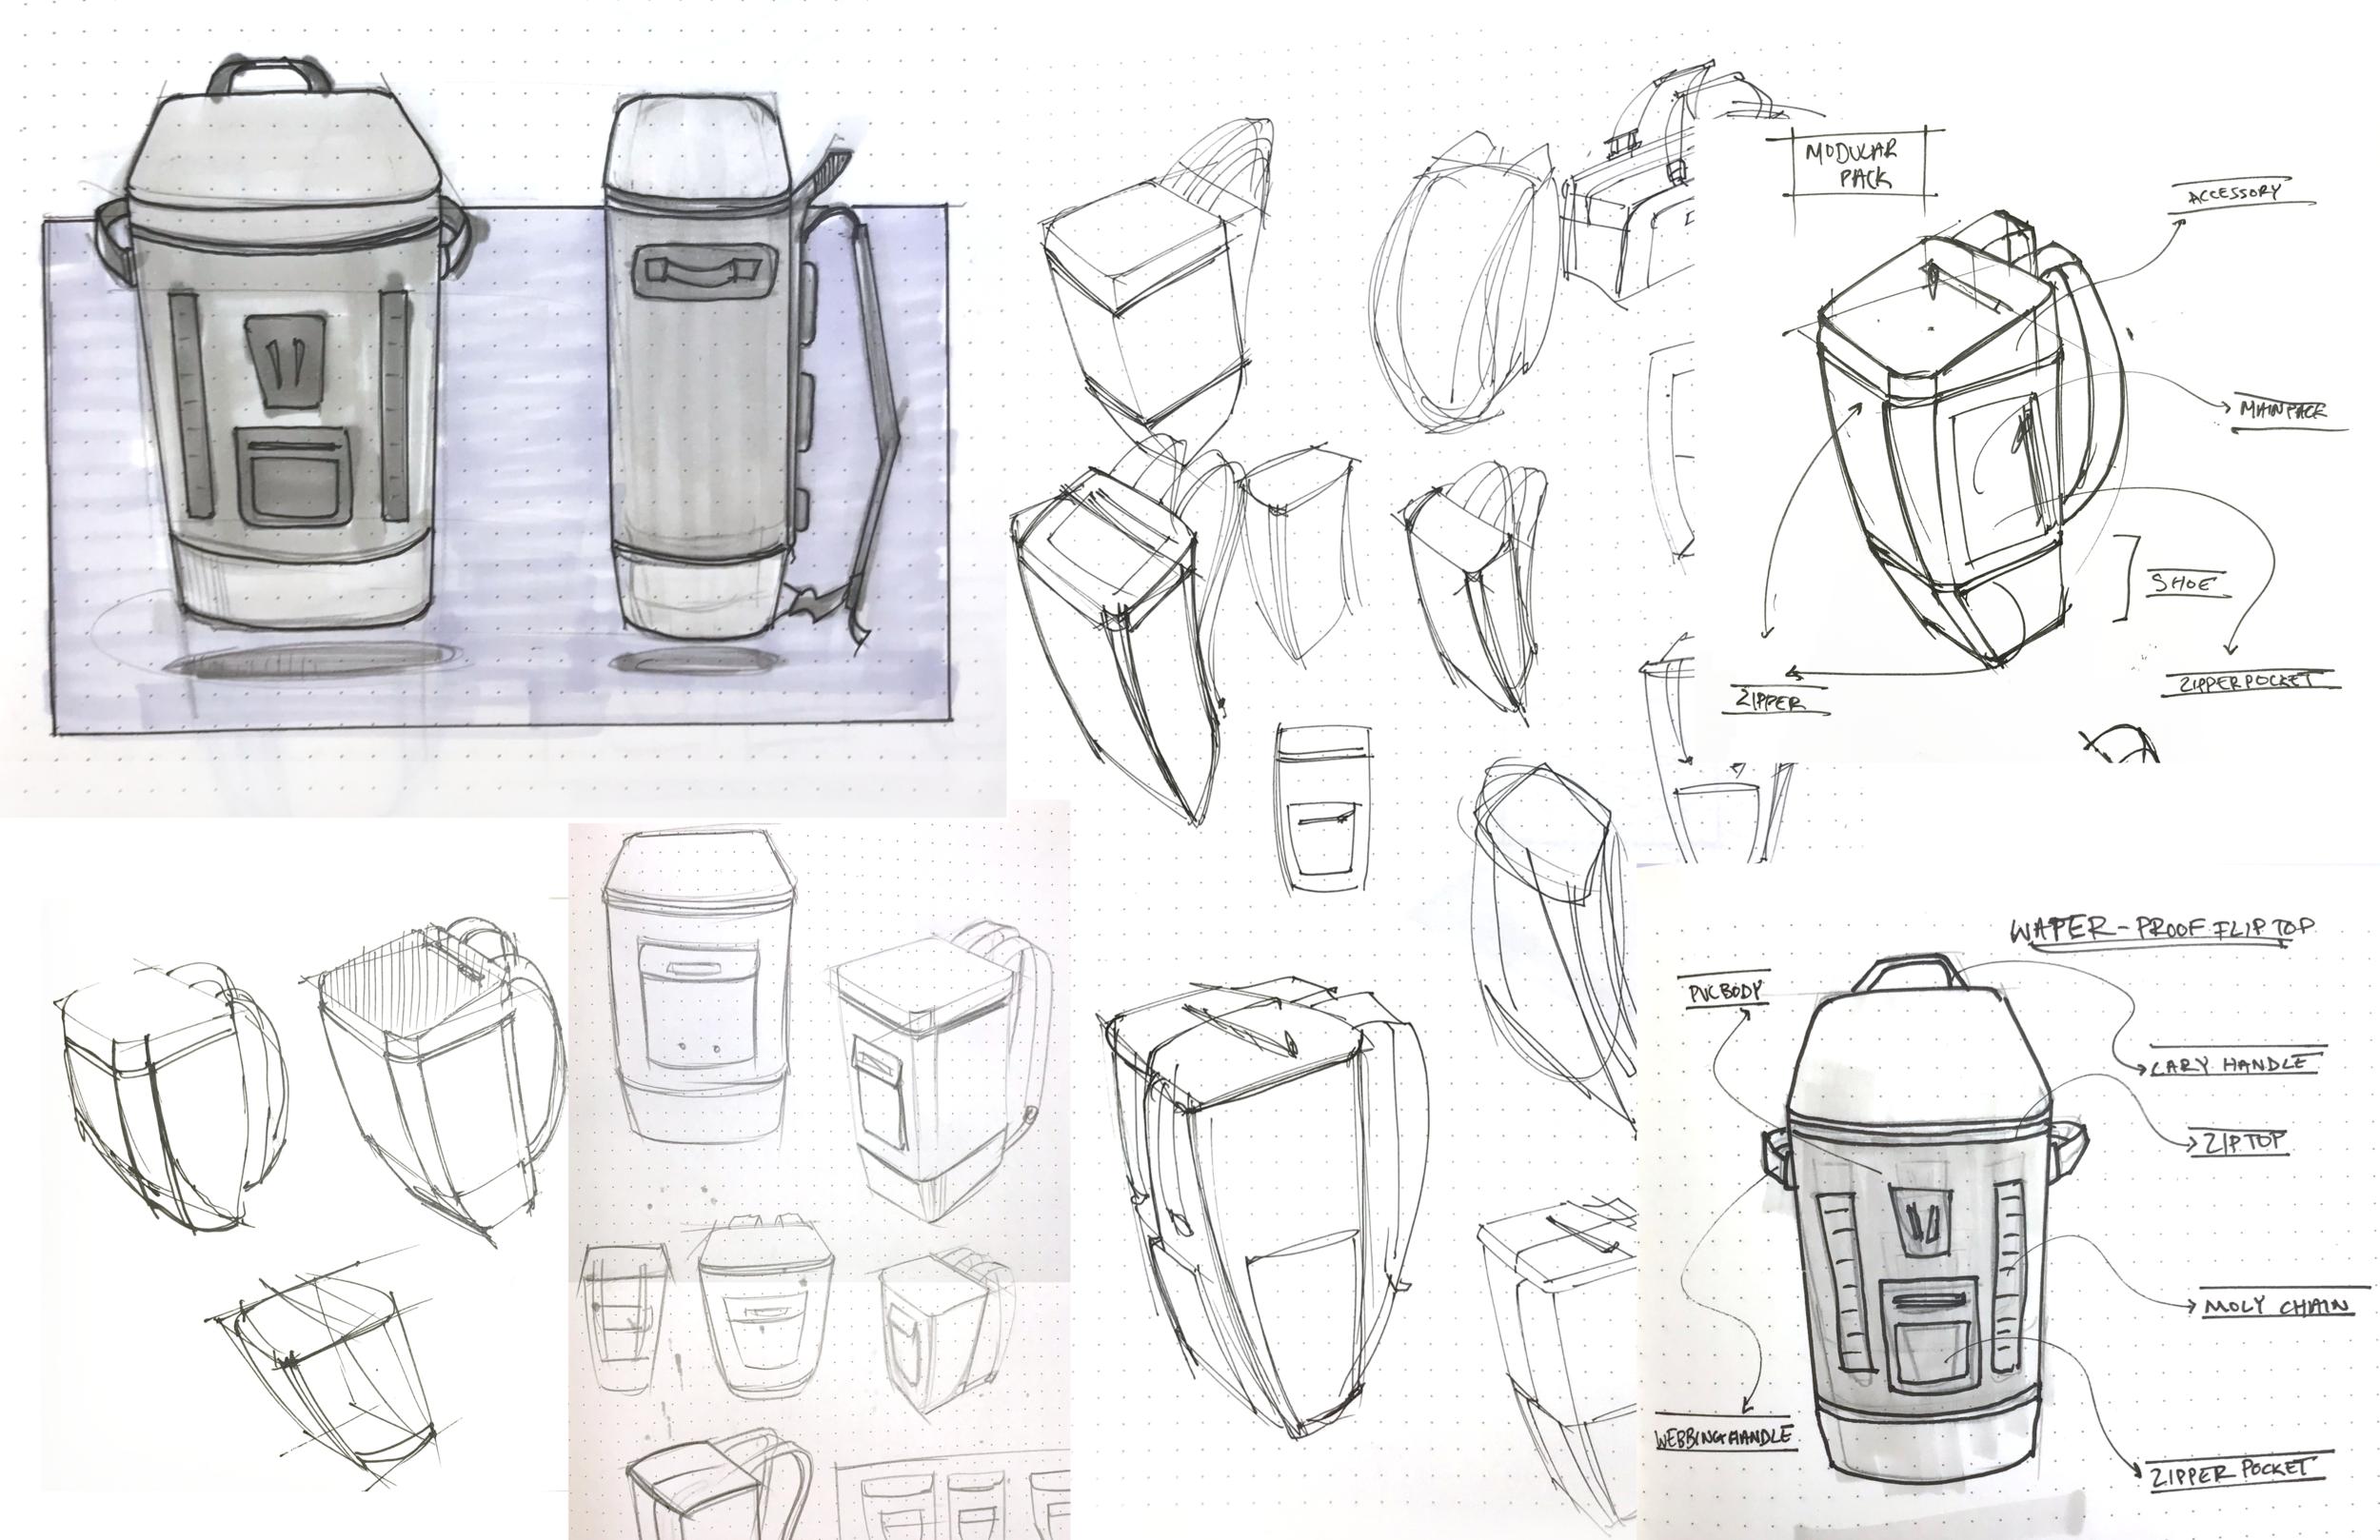 bags sketch.png